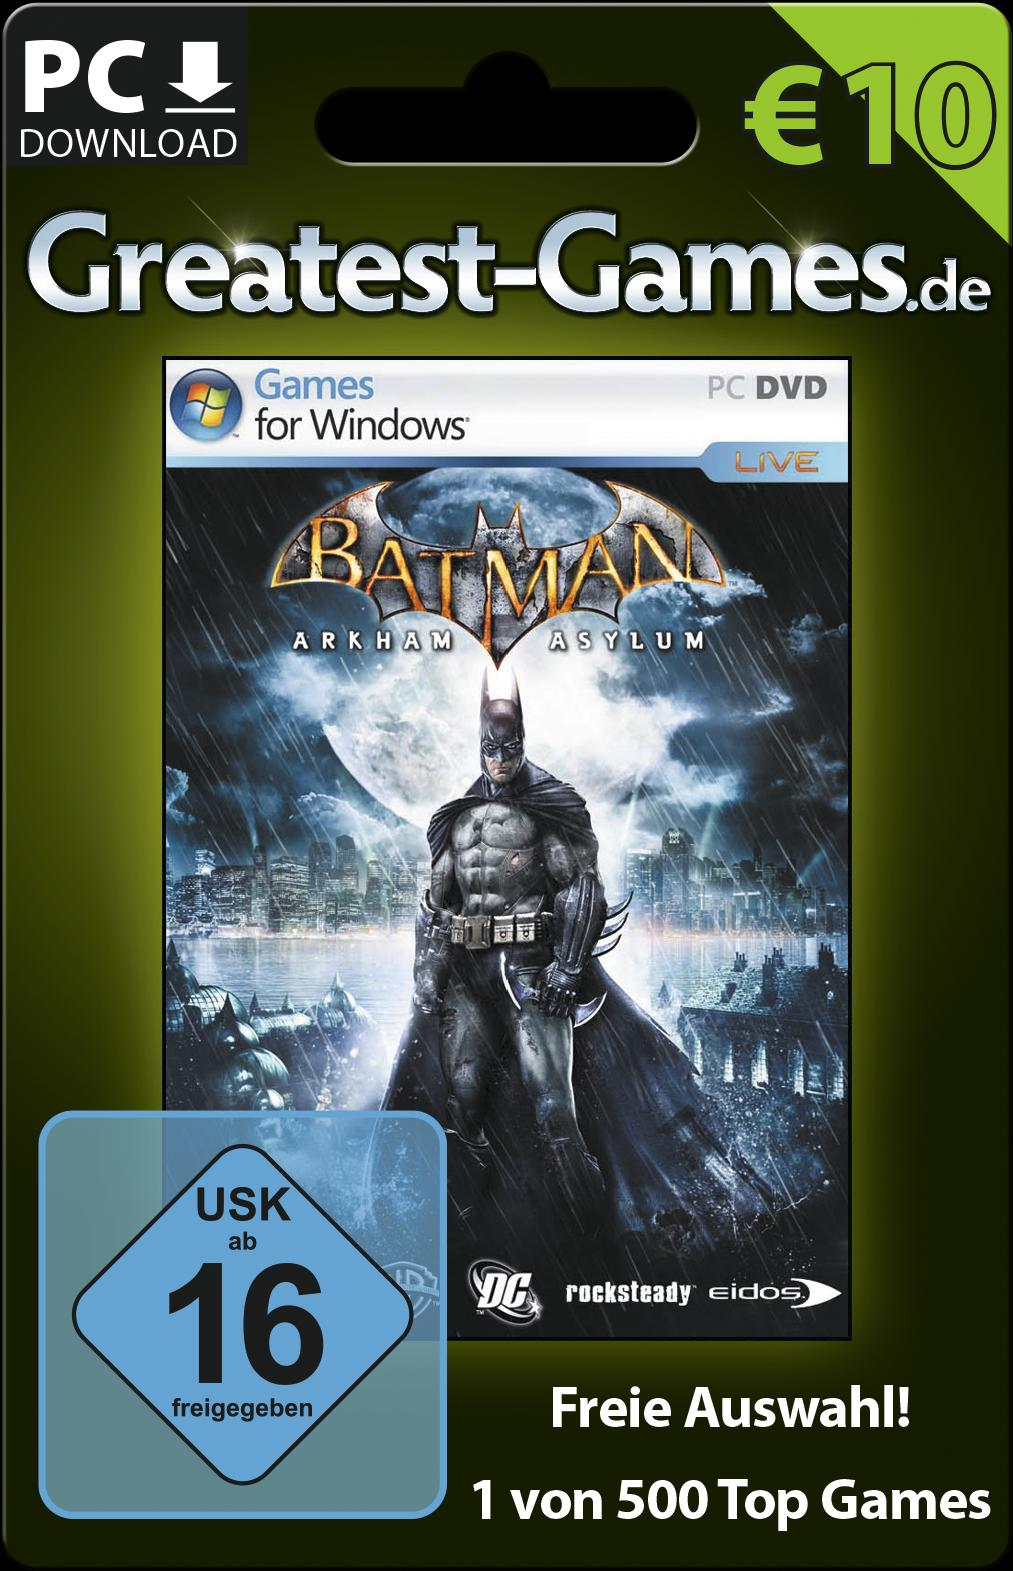 Game-Card für Batman bzw. 10 Euro. (Foto: Softdistribution GmbH)